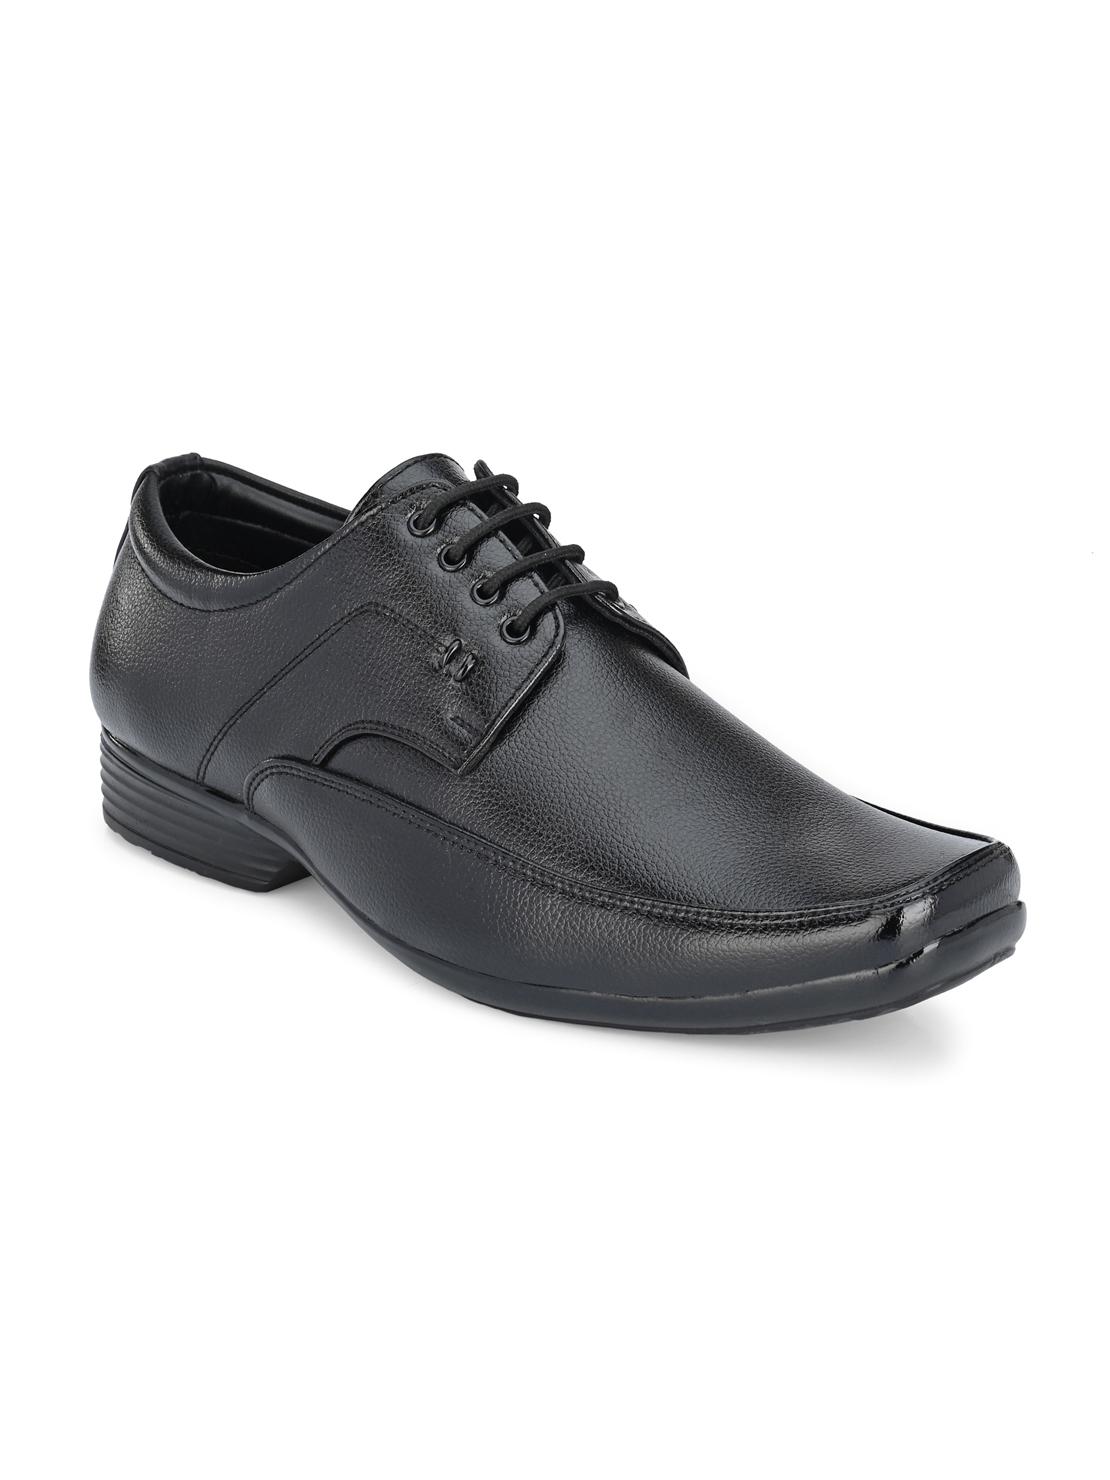 Guava | Guava Men's Square Toe Black Lace-Up Formal Shoes - 6 (UK)